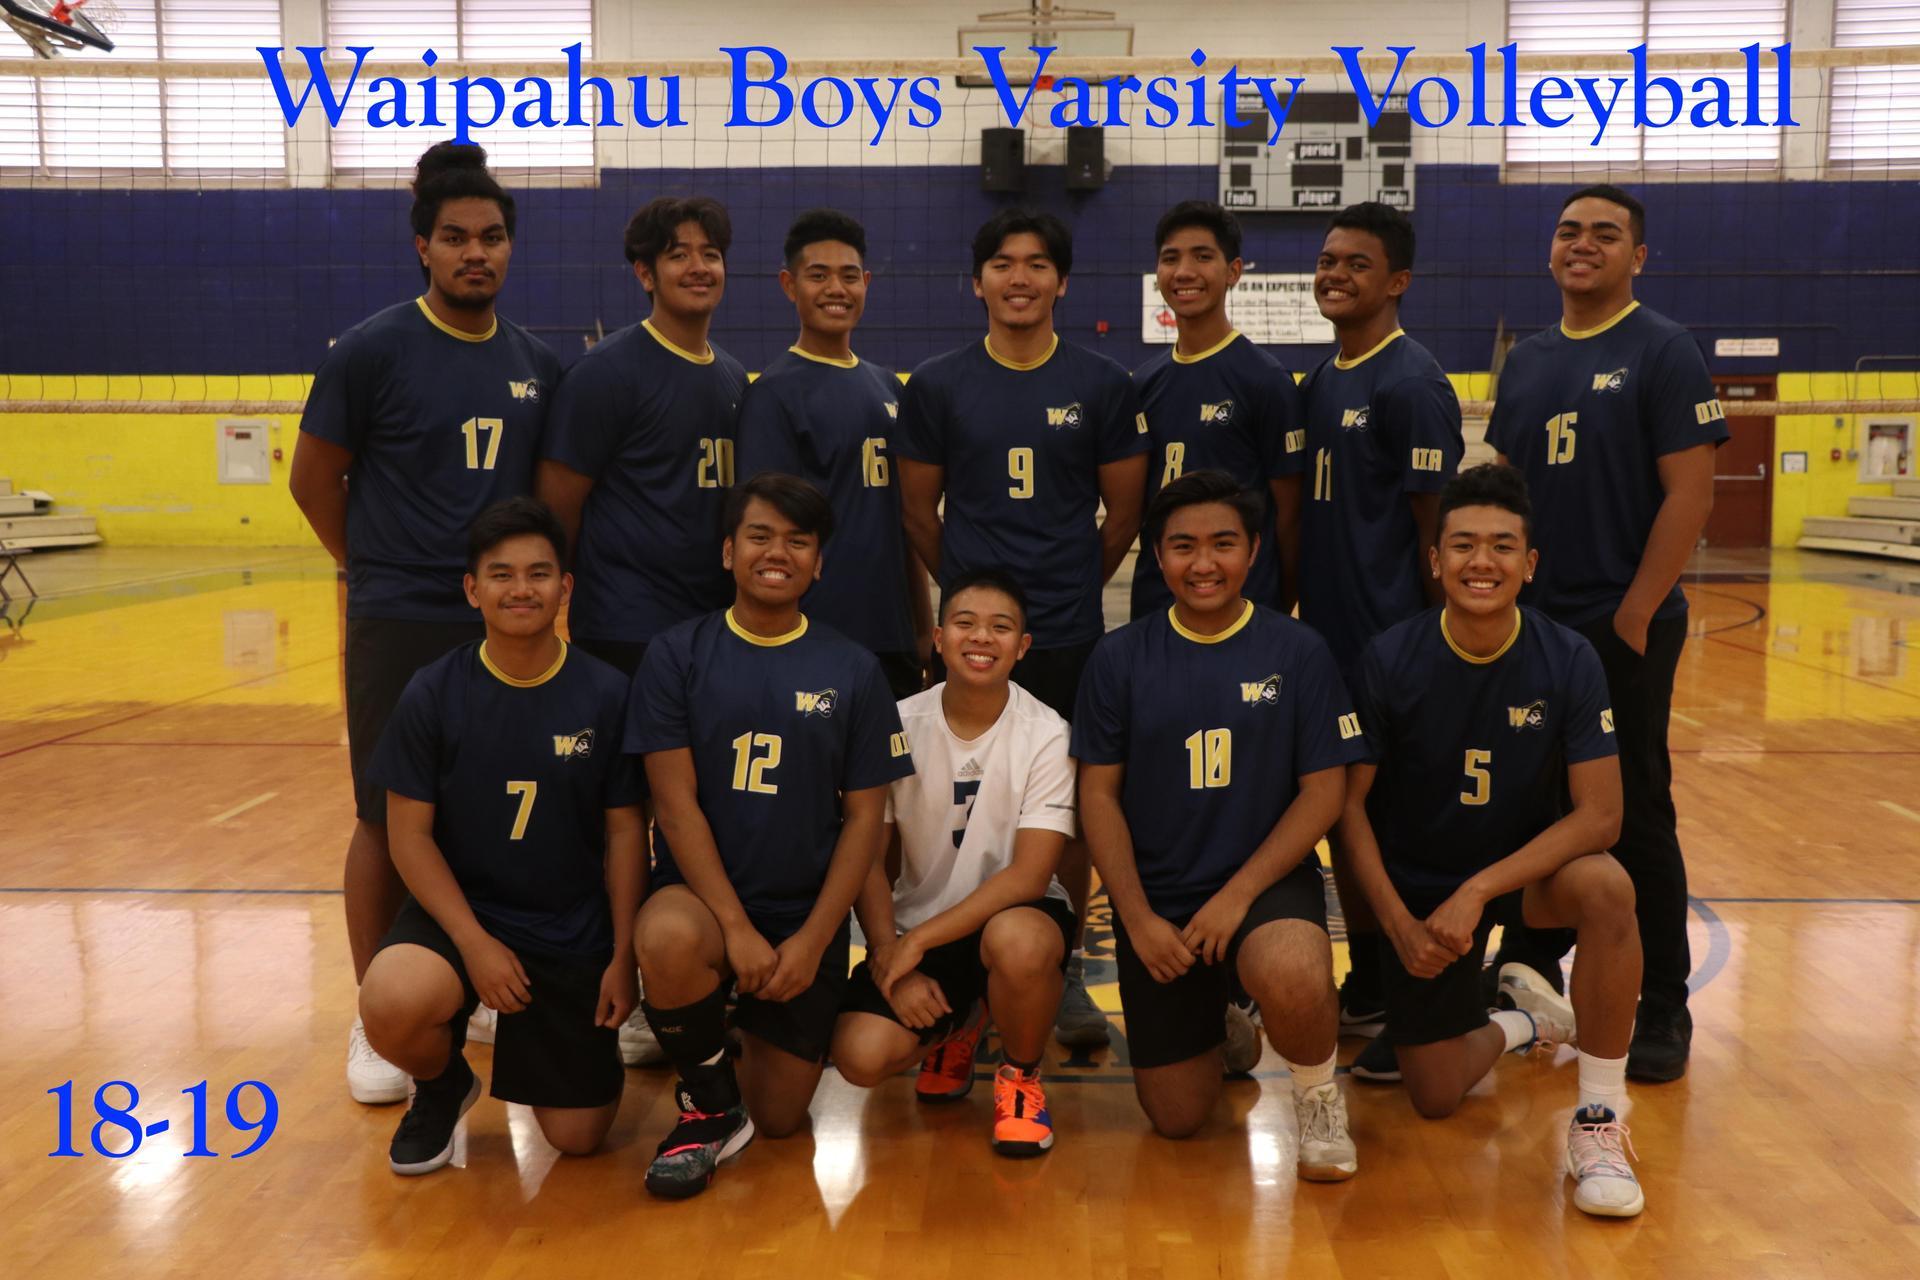 18-19 Volleyball Boys Varsity